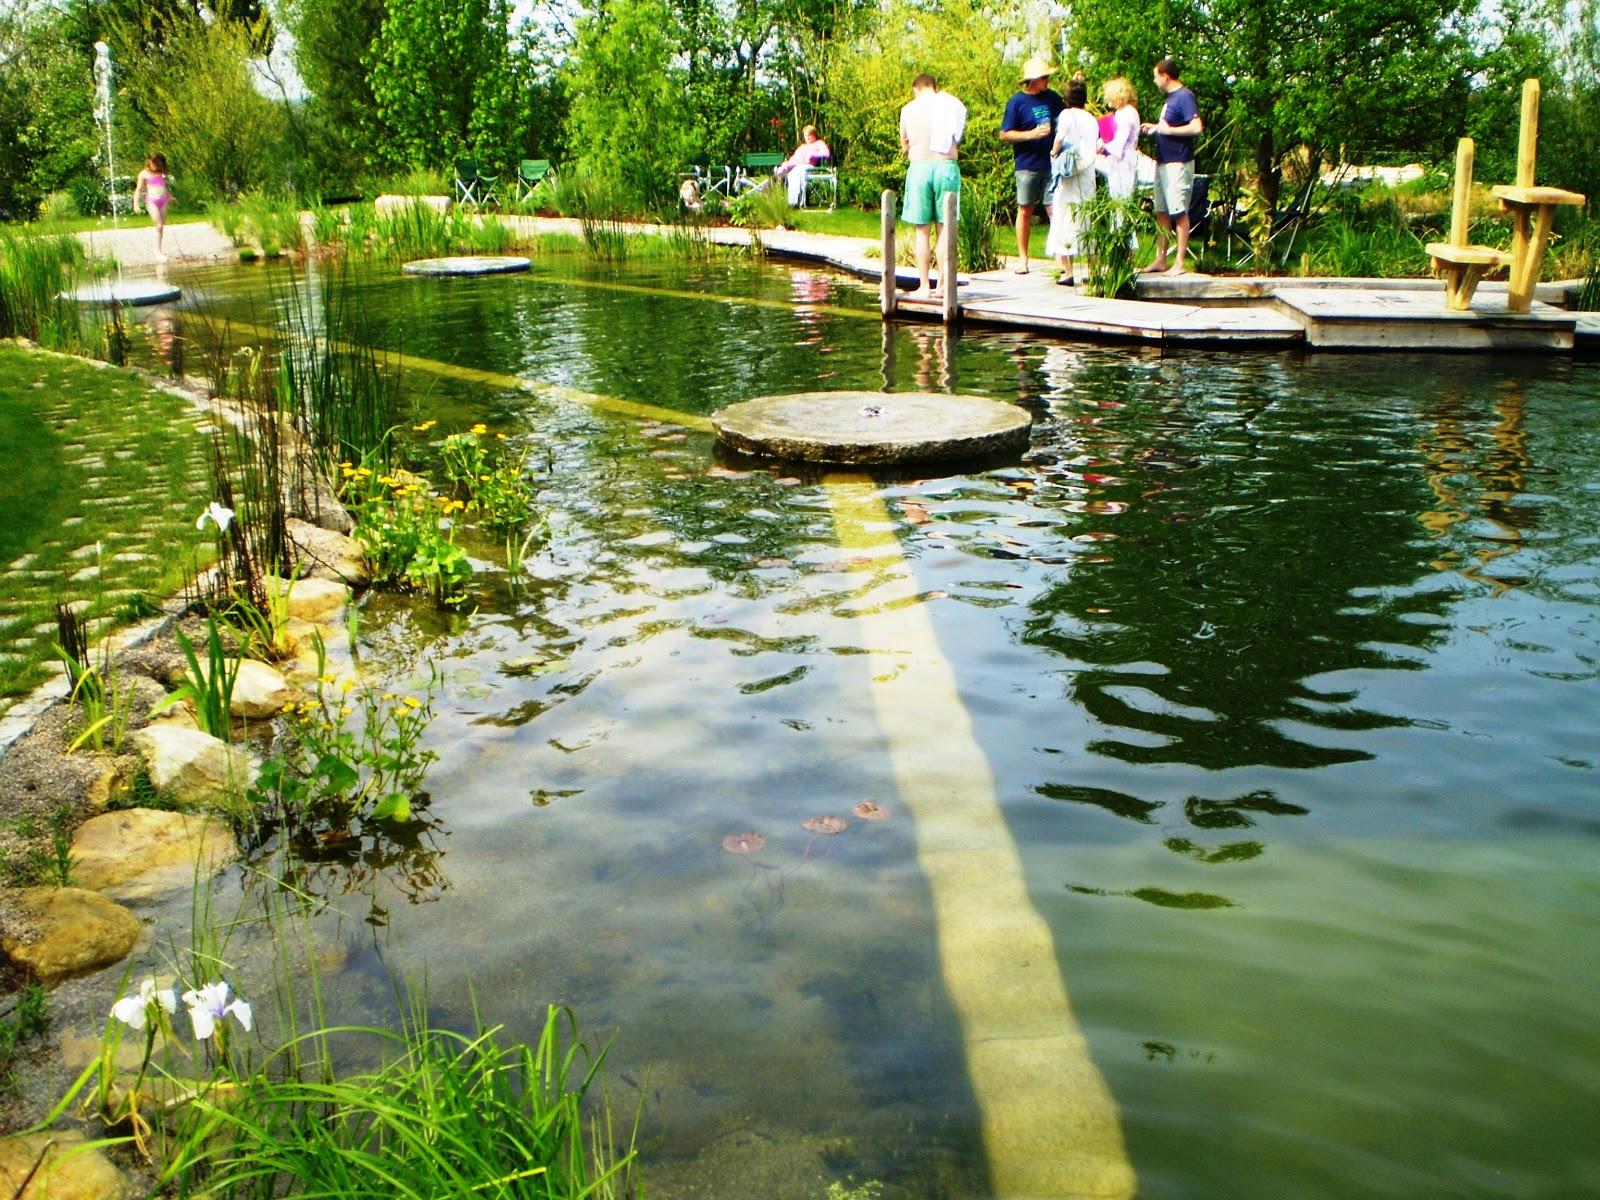 Fernando ruz piscinas naturales Piscina natural jardin